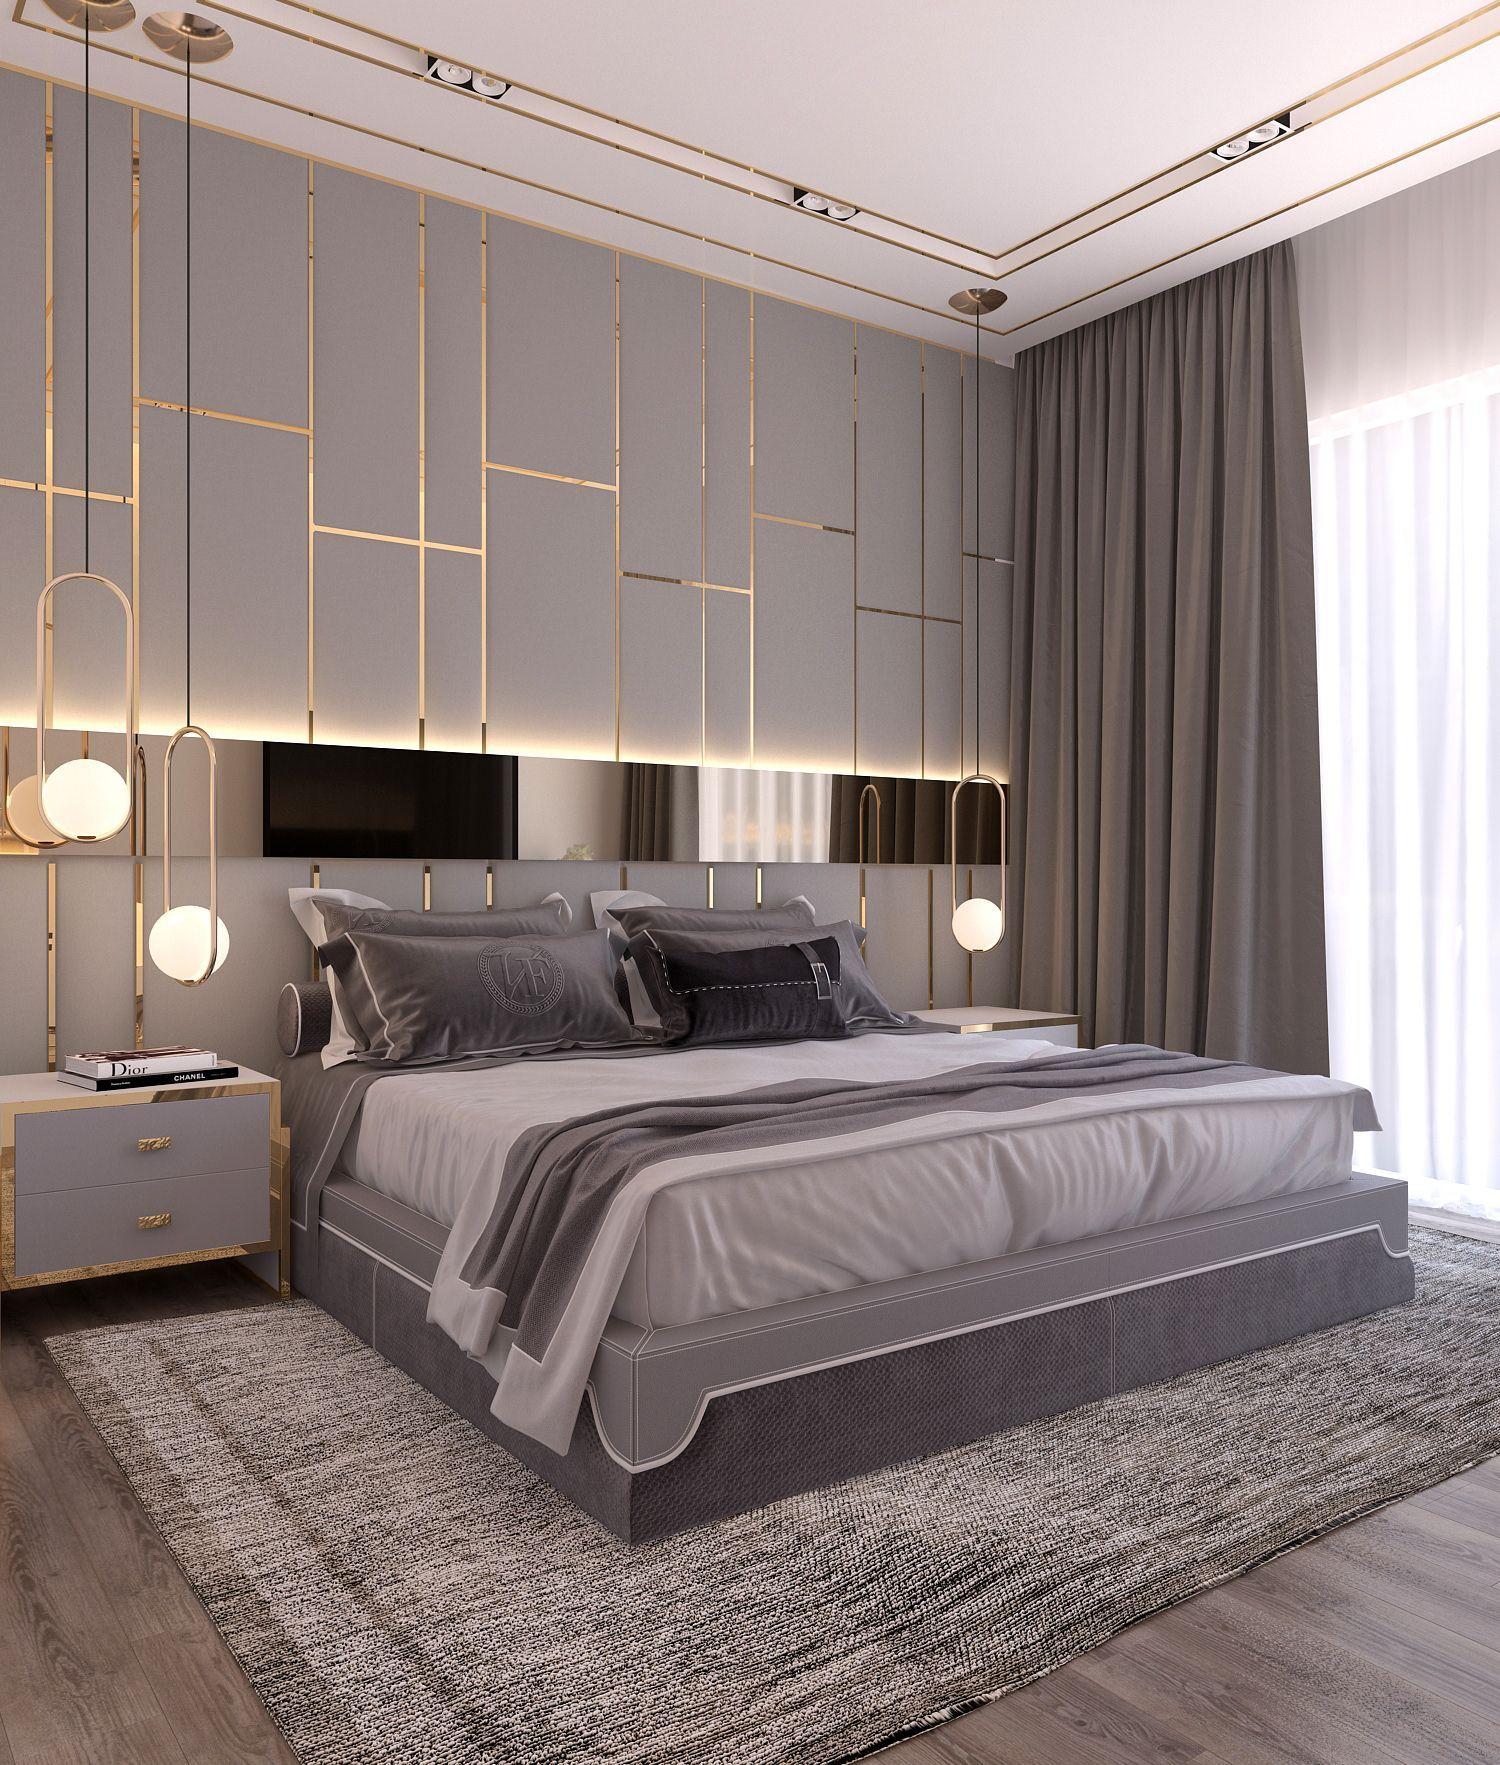 Master Bedroom Simple Modern House Interior Design Homyracks